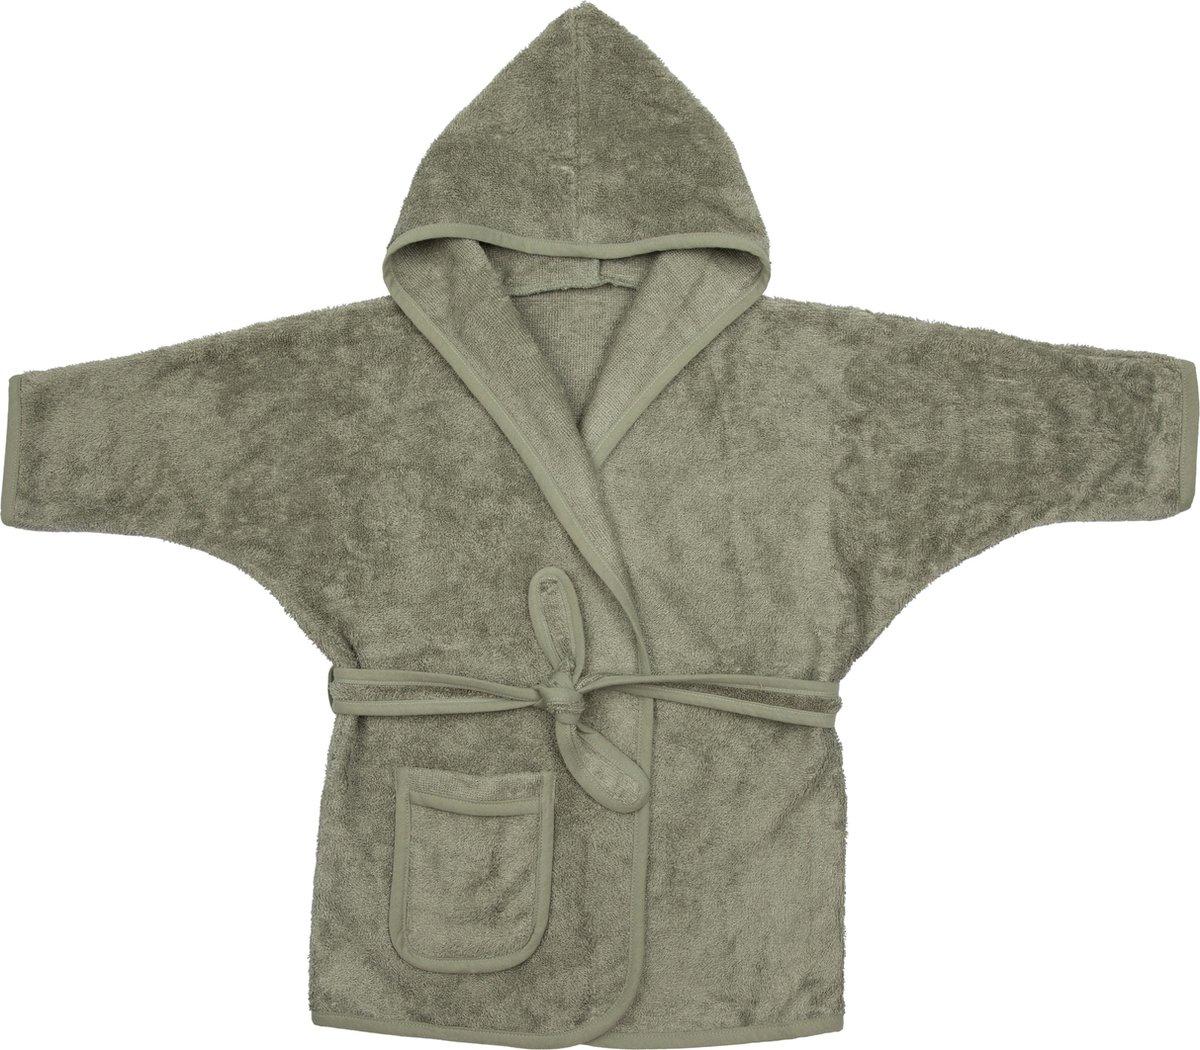 Timboo Badjas kind Whisper green 8/10 jaar - Bamboe - Extra zacht - Kinderbadjas - groen